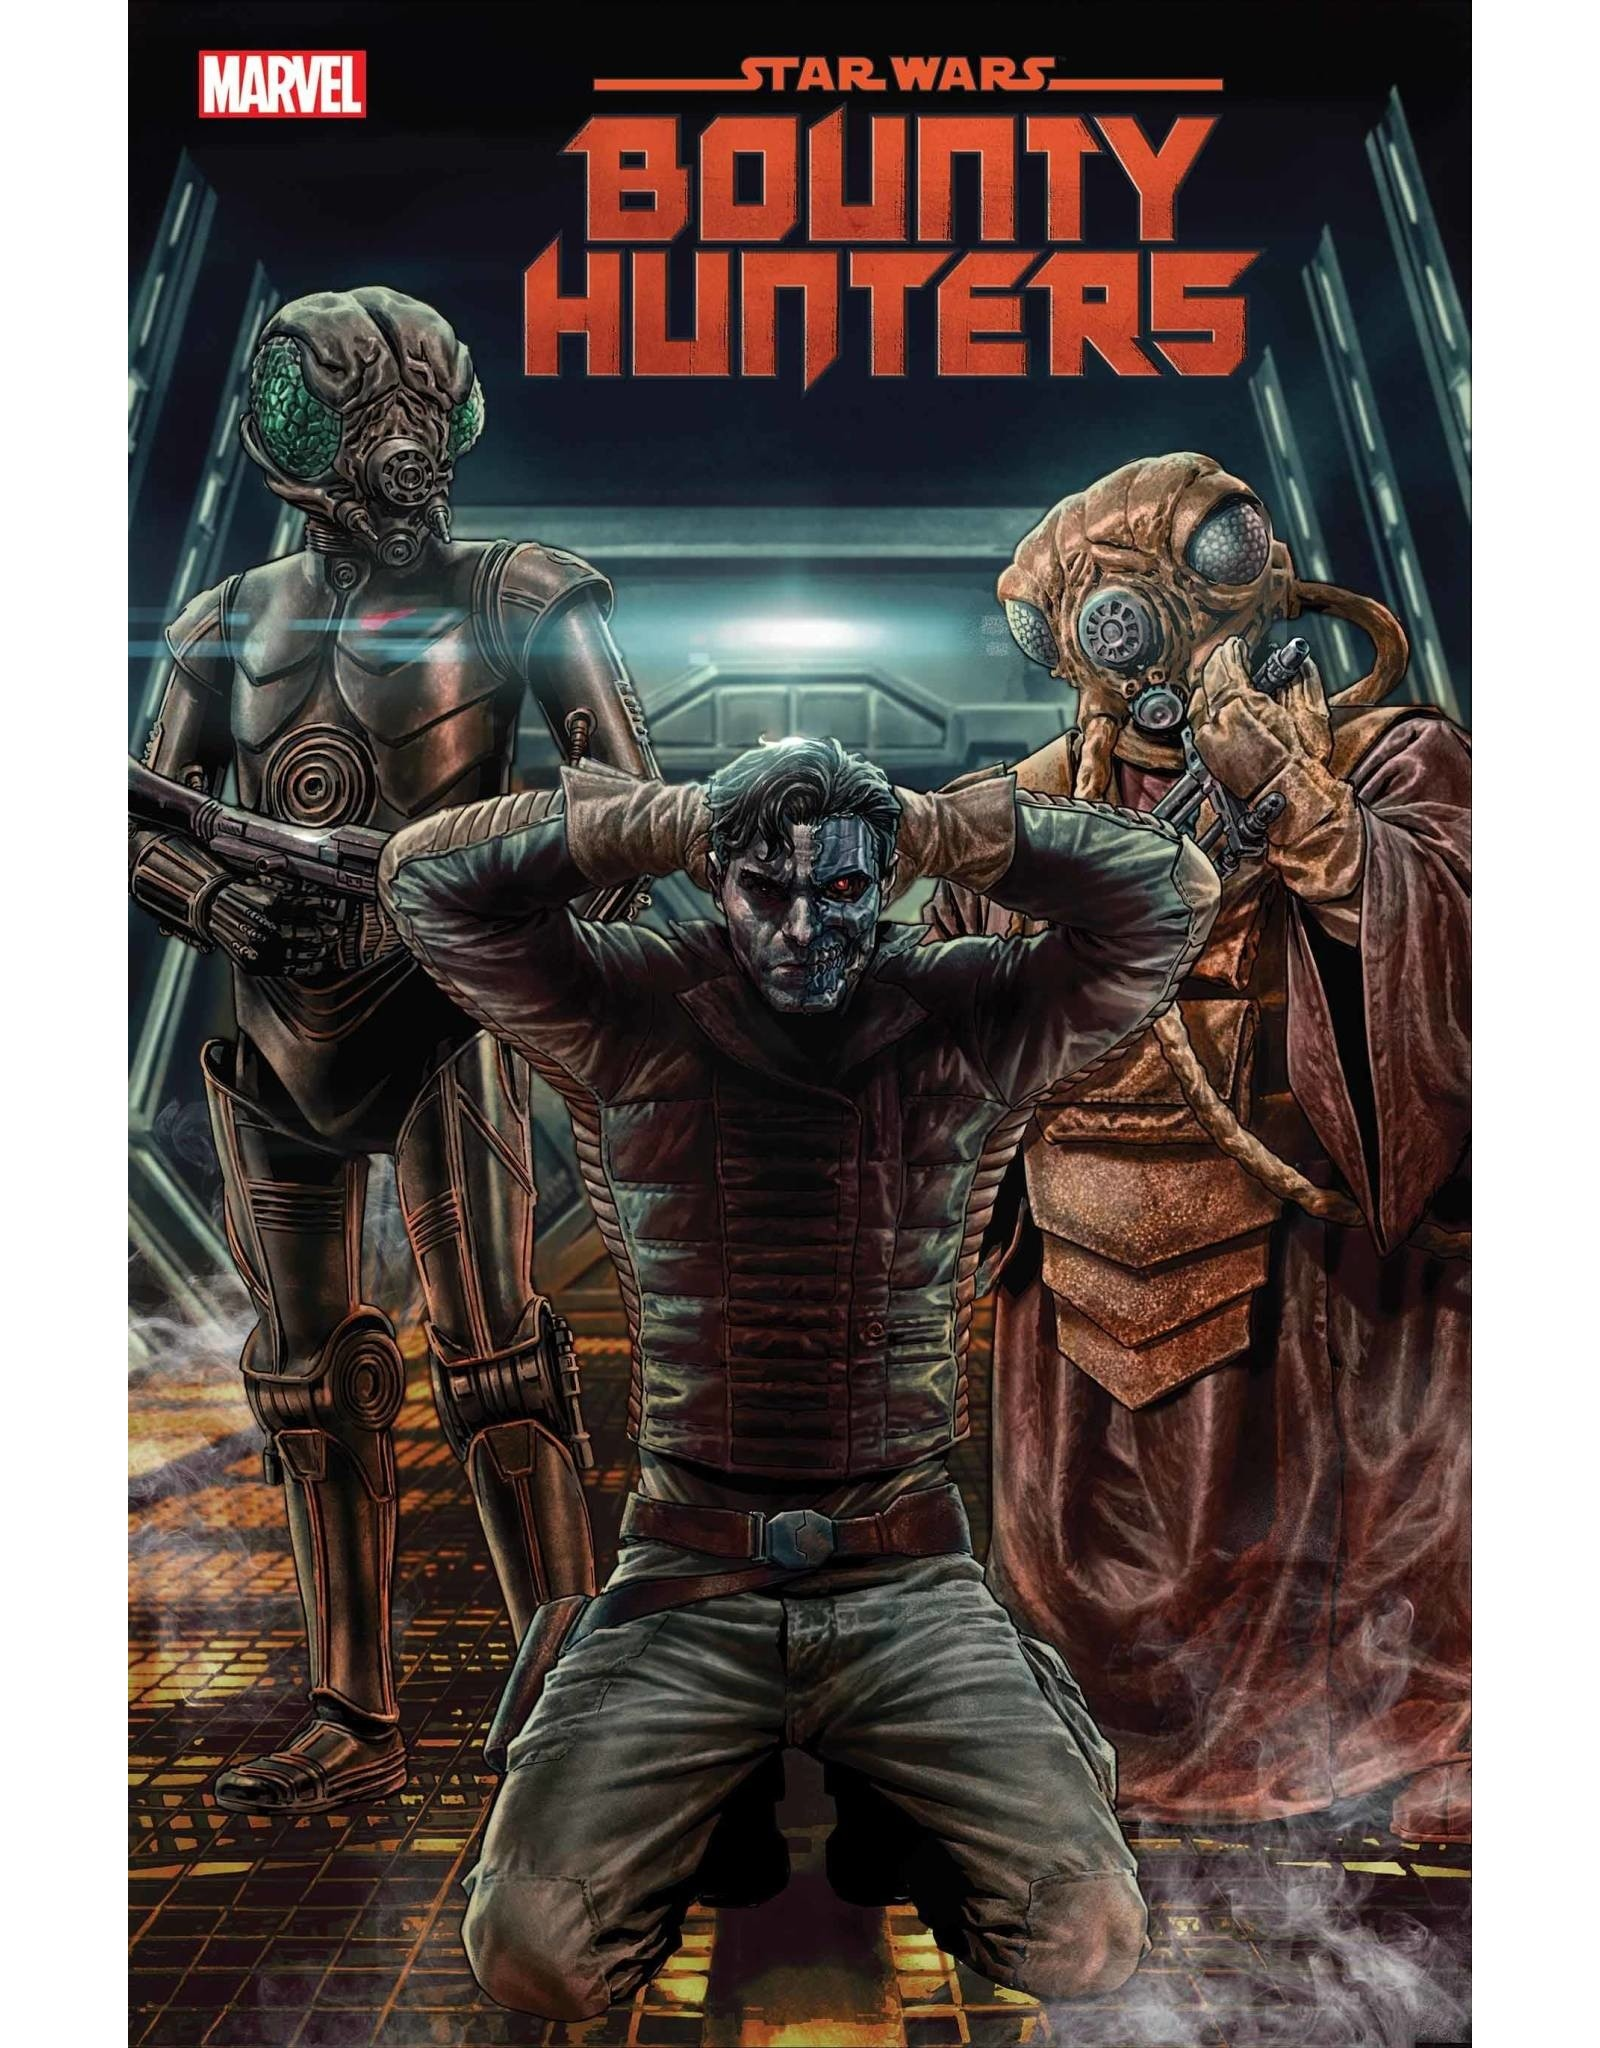 Marvel Comics STAR WARS BOUNTY HUNTERS #6